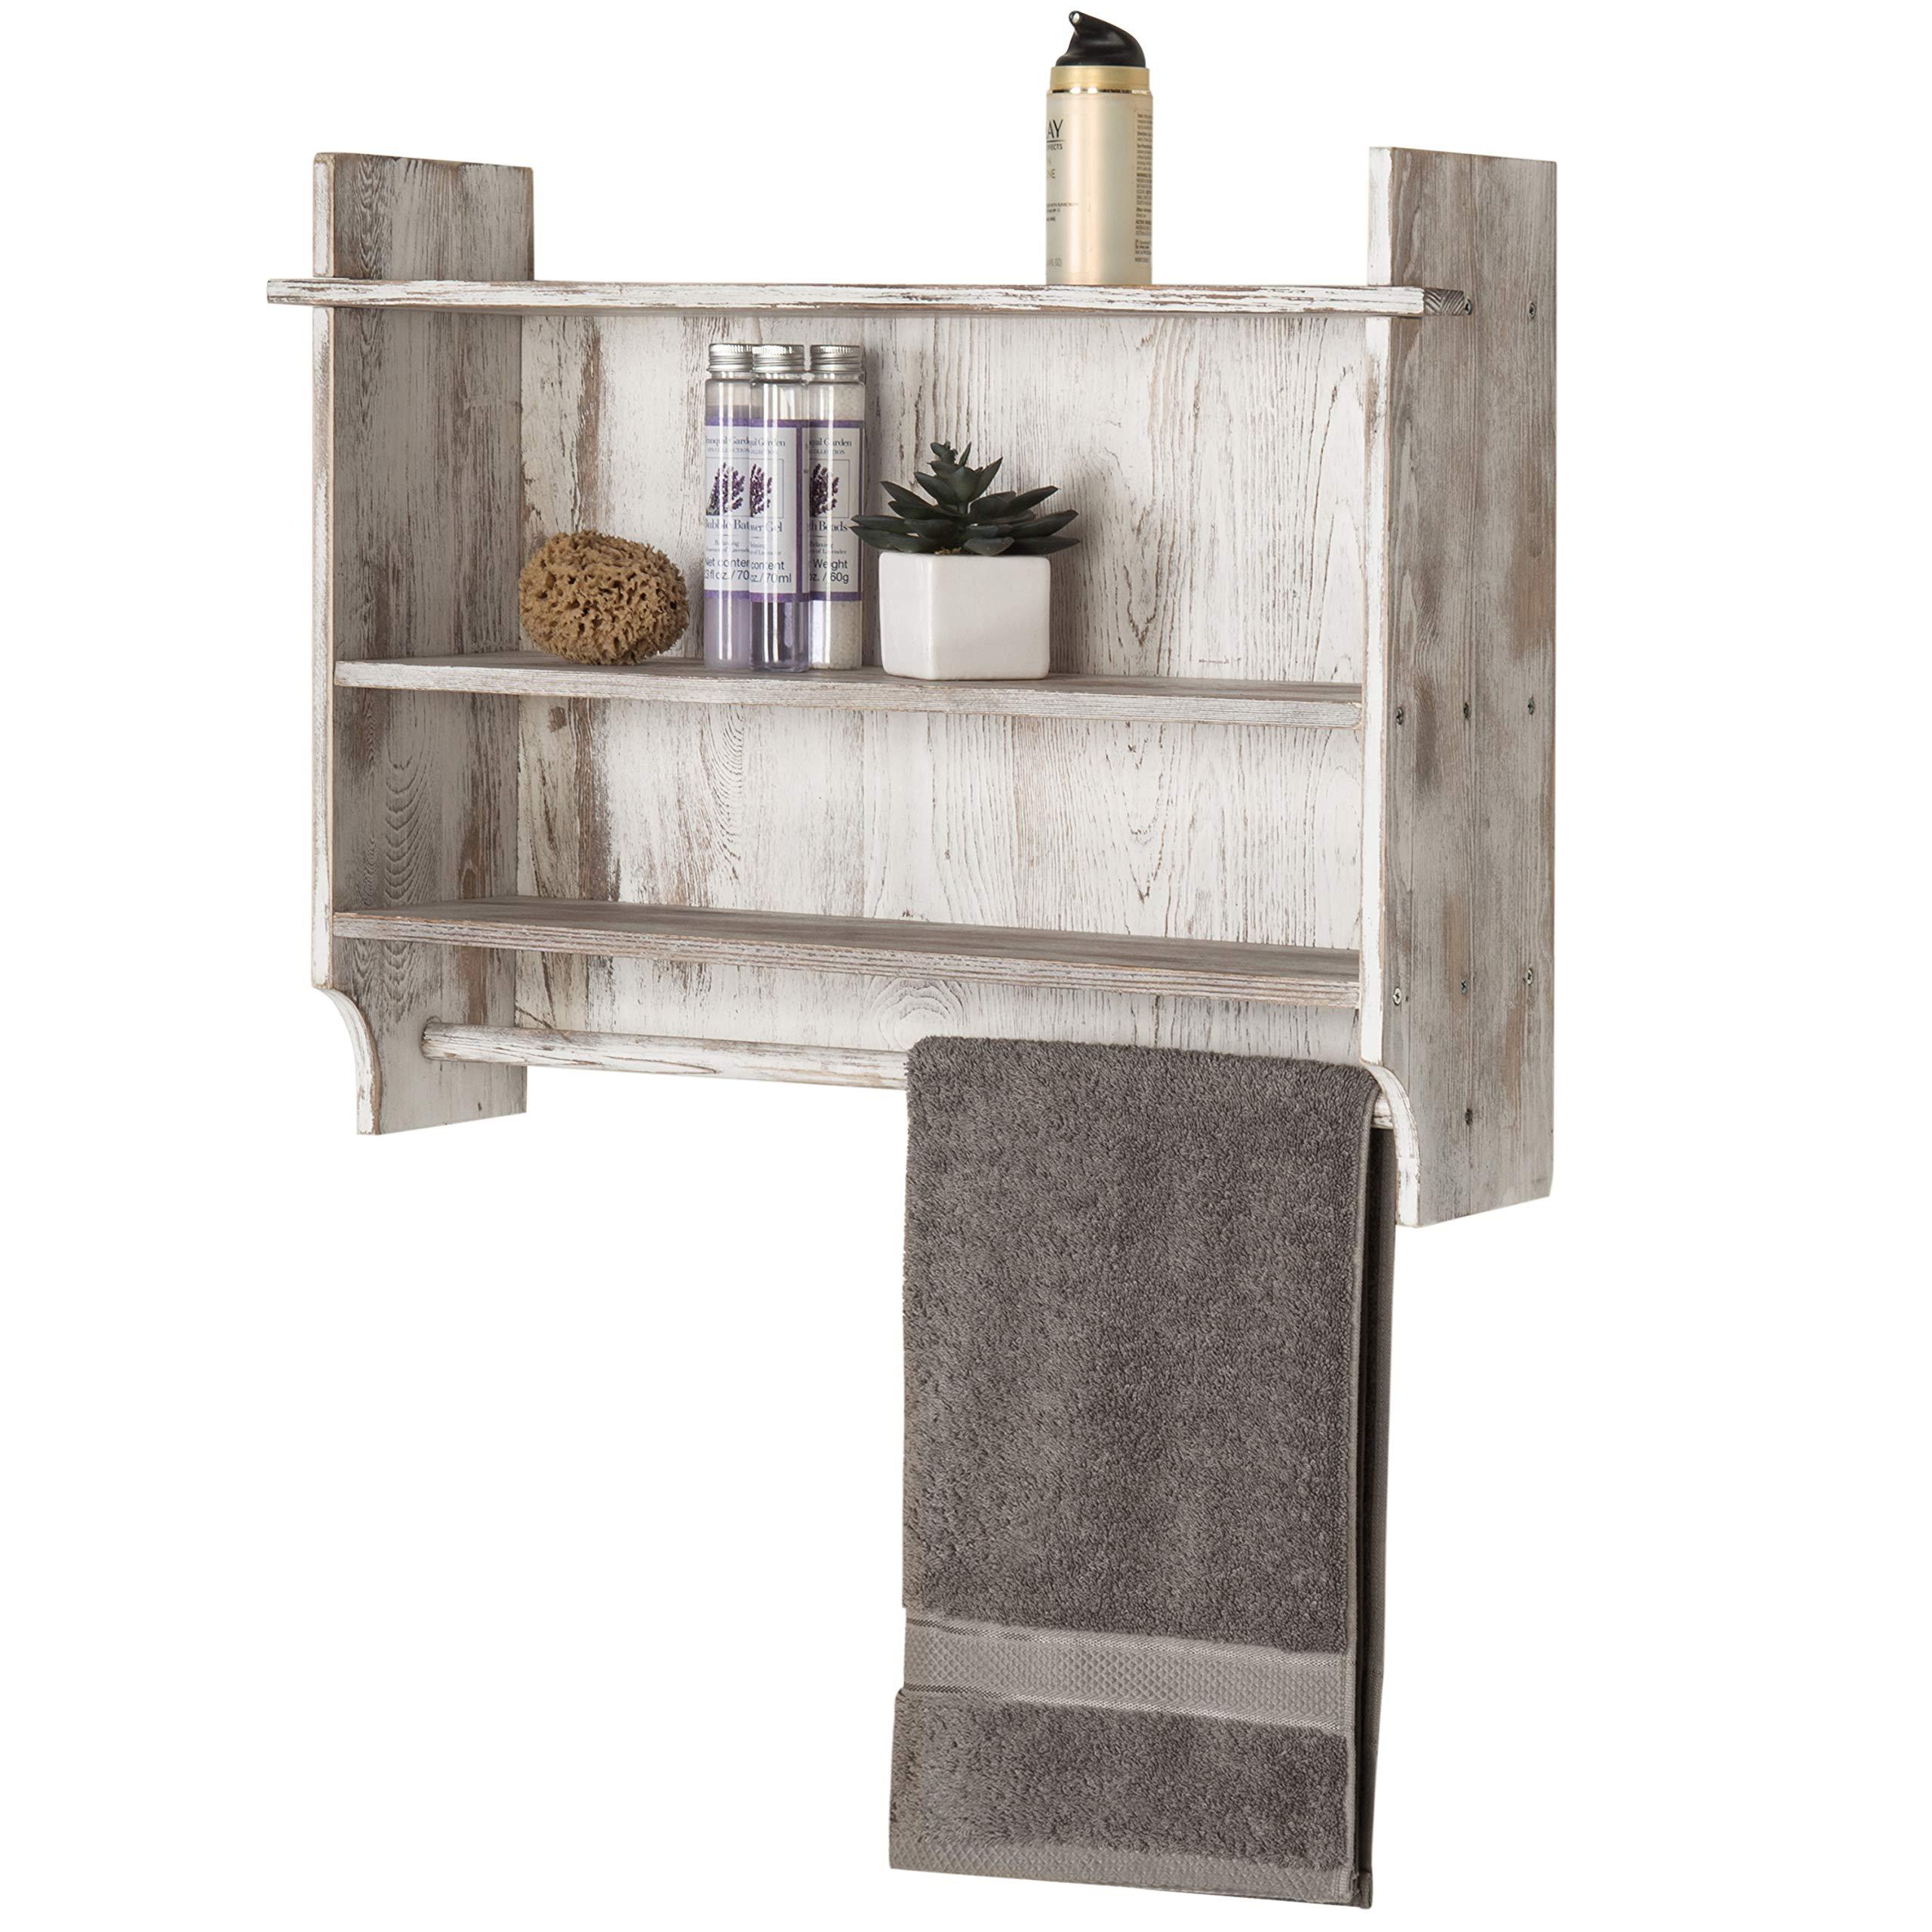 MyGift 3-Shelf Whitewashed Wall Mounted Bathroom Organizer Rack with Towel Bar by MyGift